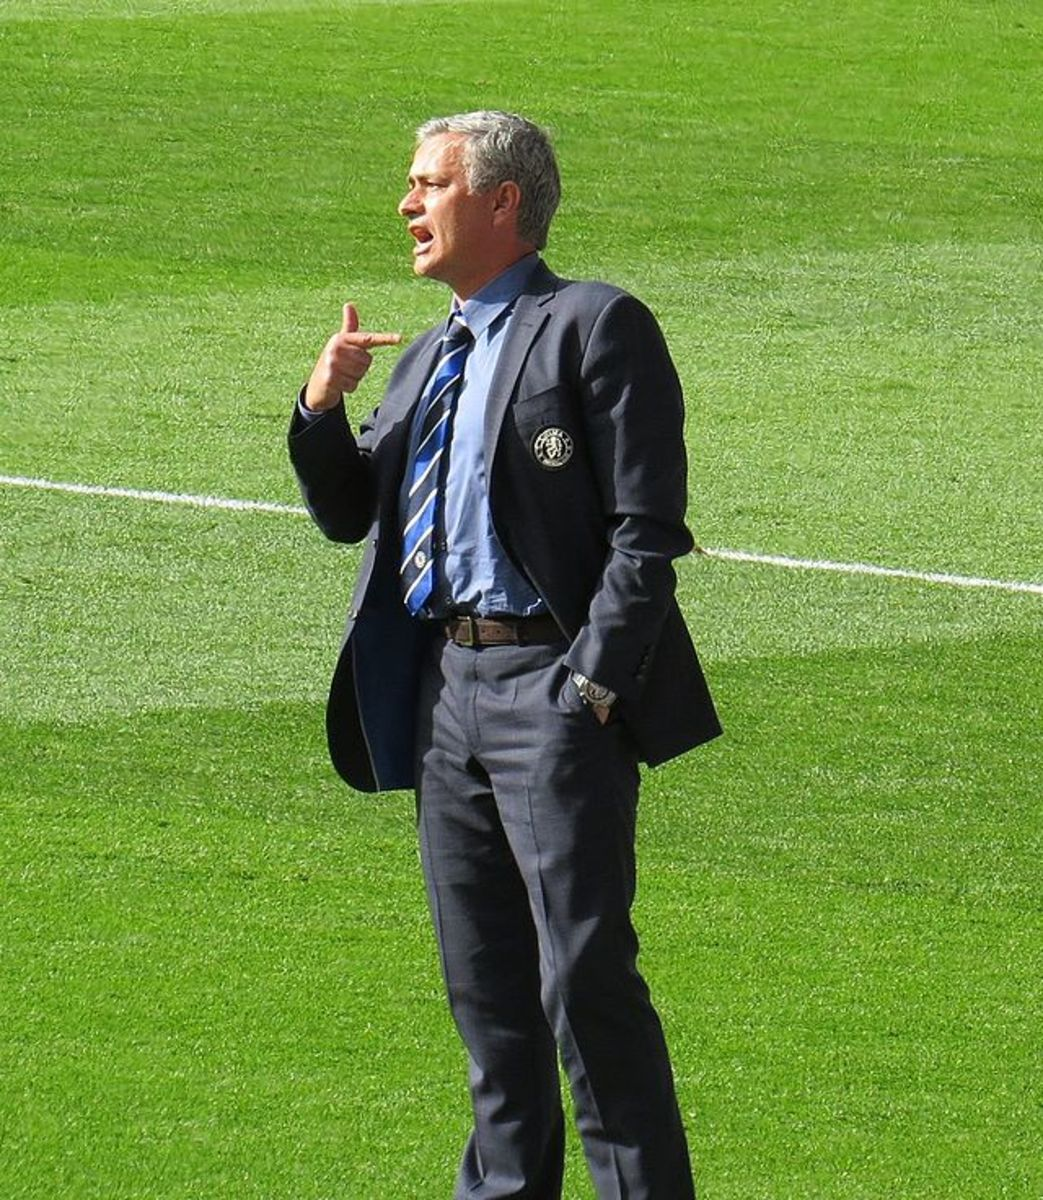 Jose Mourinho—will he ever return to the EPL?